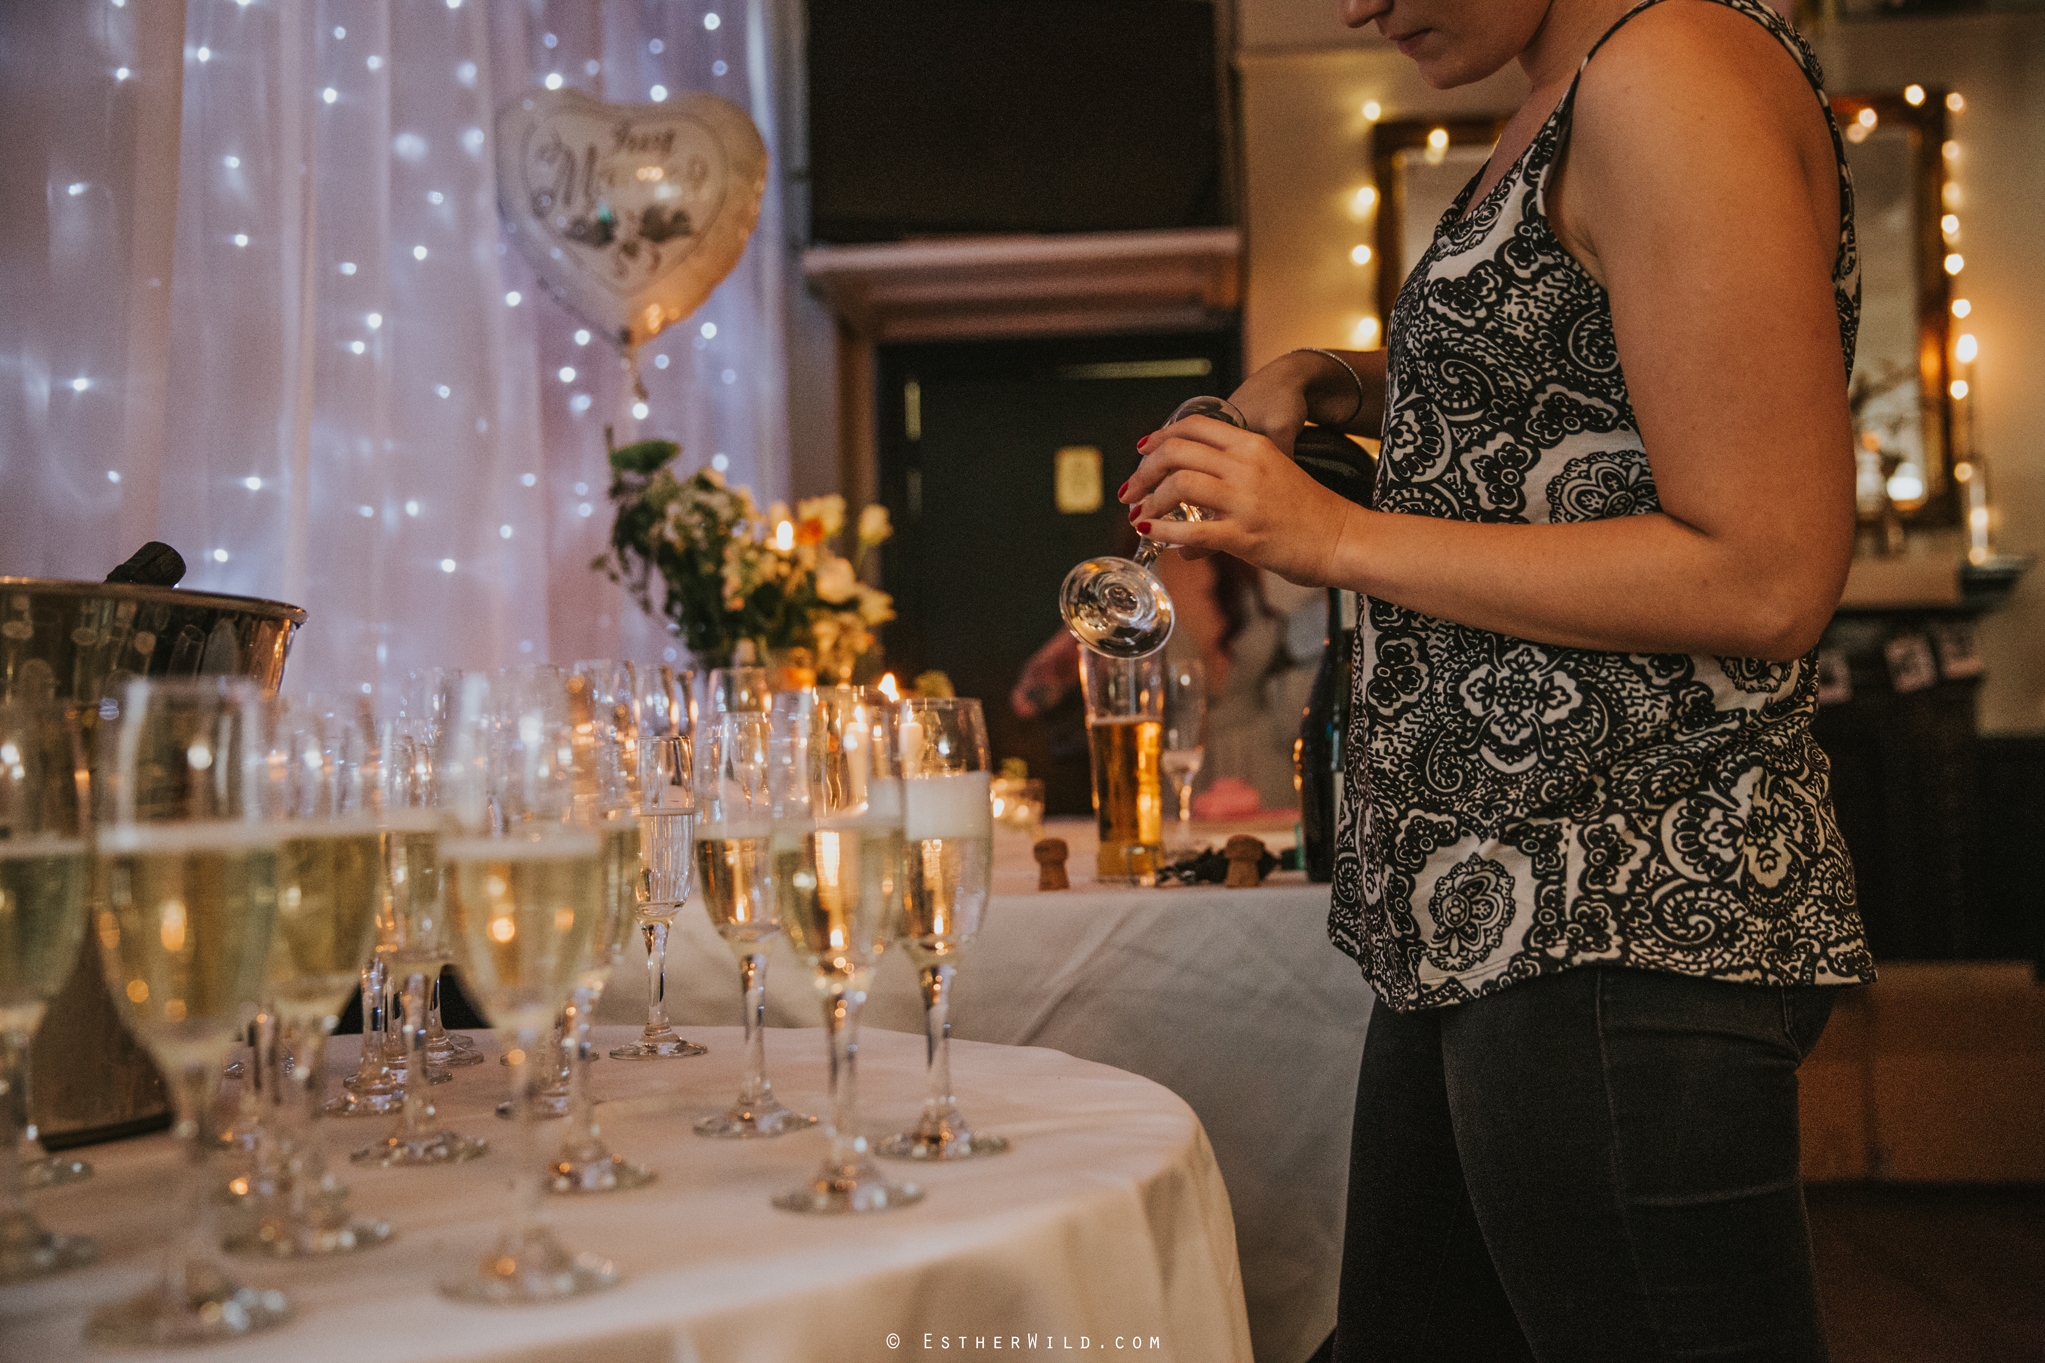 Islington_Town_Hall_Wedding_London_Photographer_Esther_Wild_IMG_7318.jpg